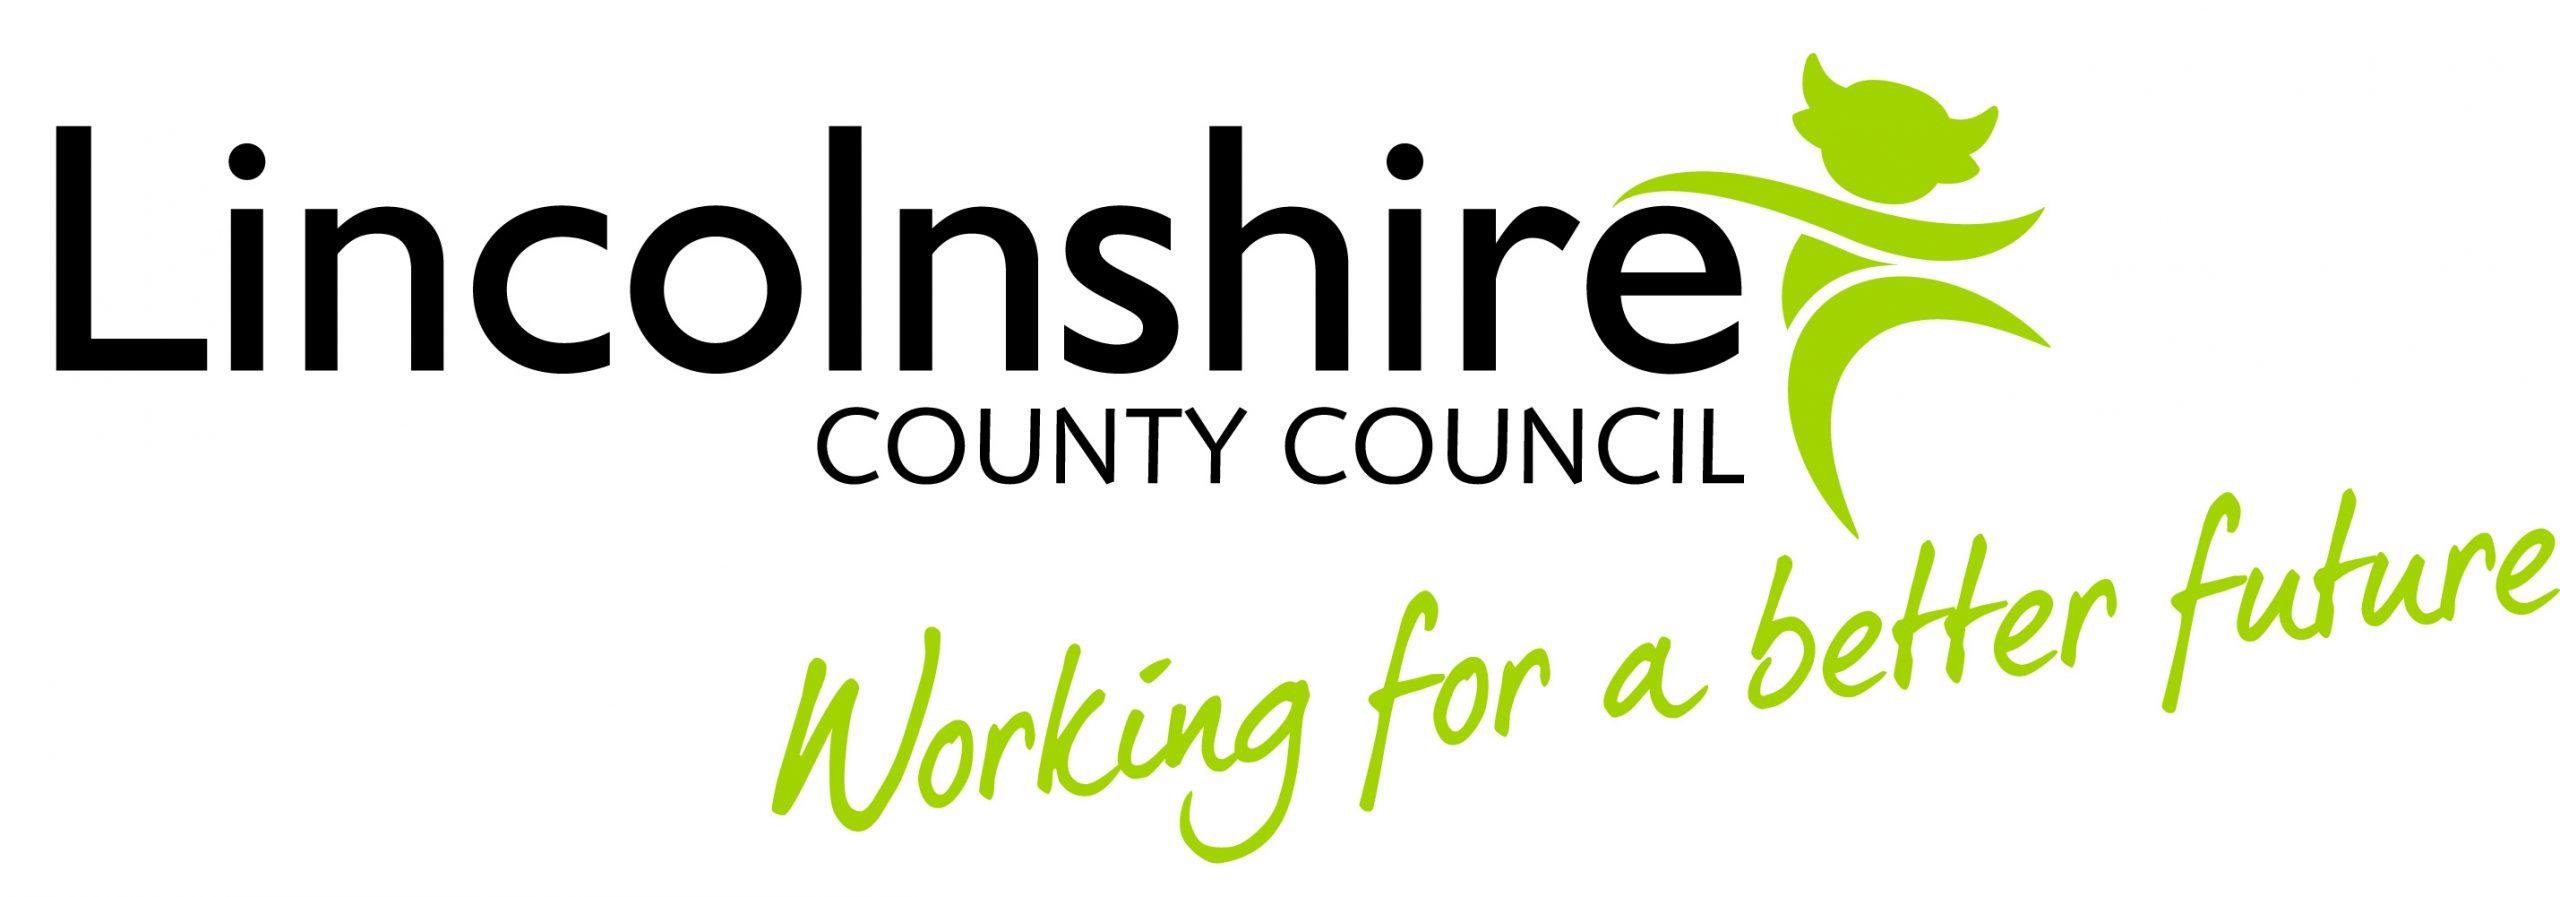 Lincolnshire Council